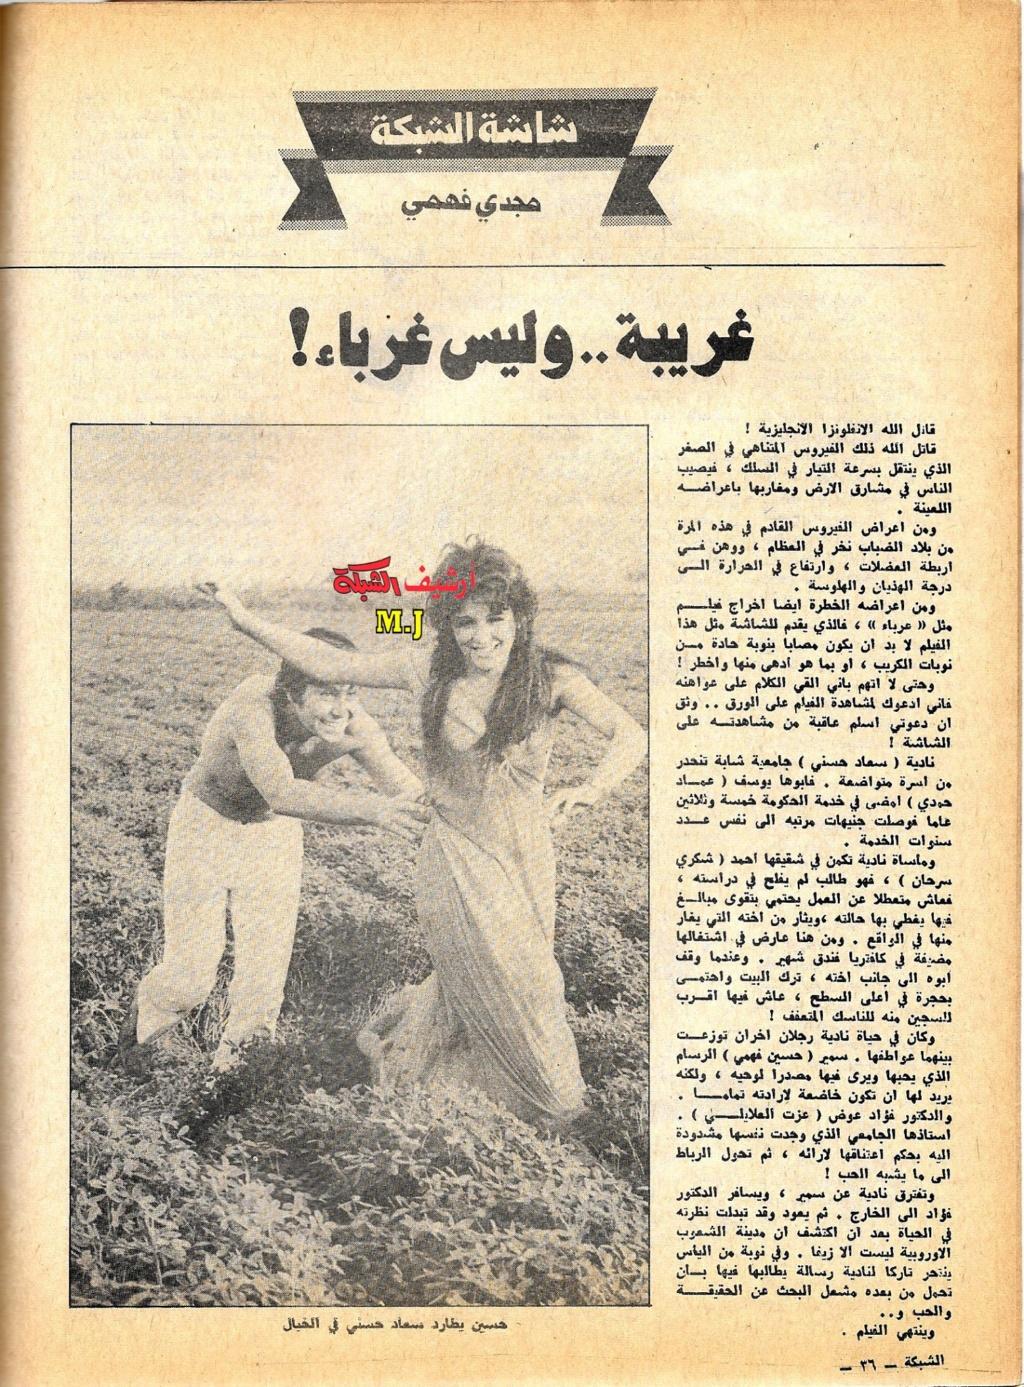 نقد صحفي : غريبة ... وليس غرباء ! 1973 م 1381